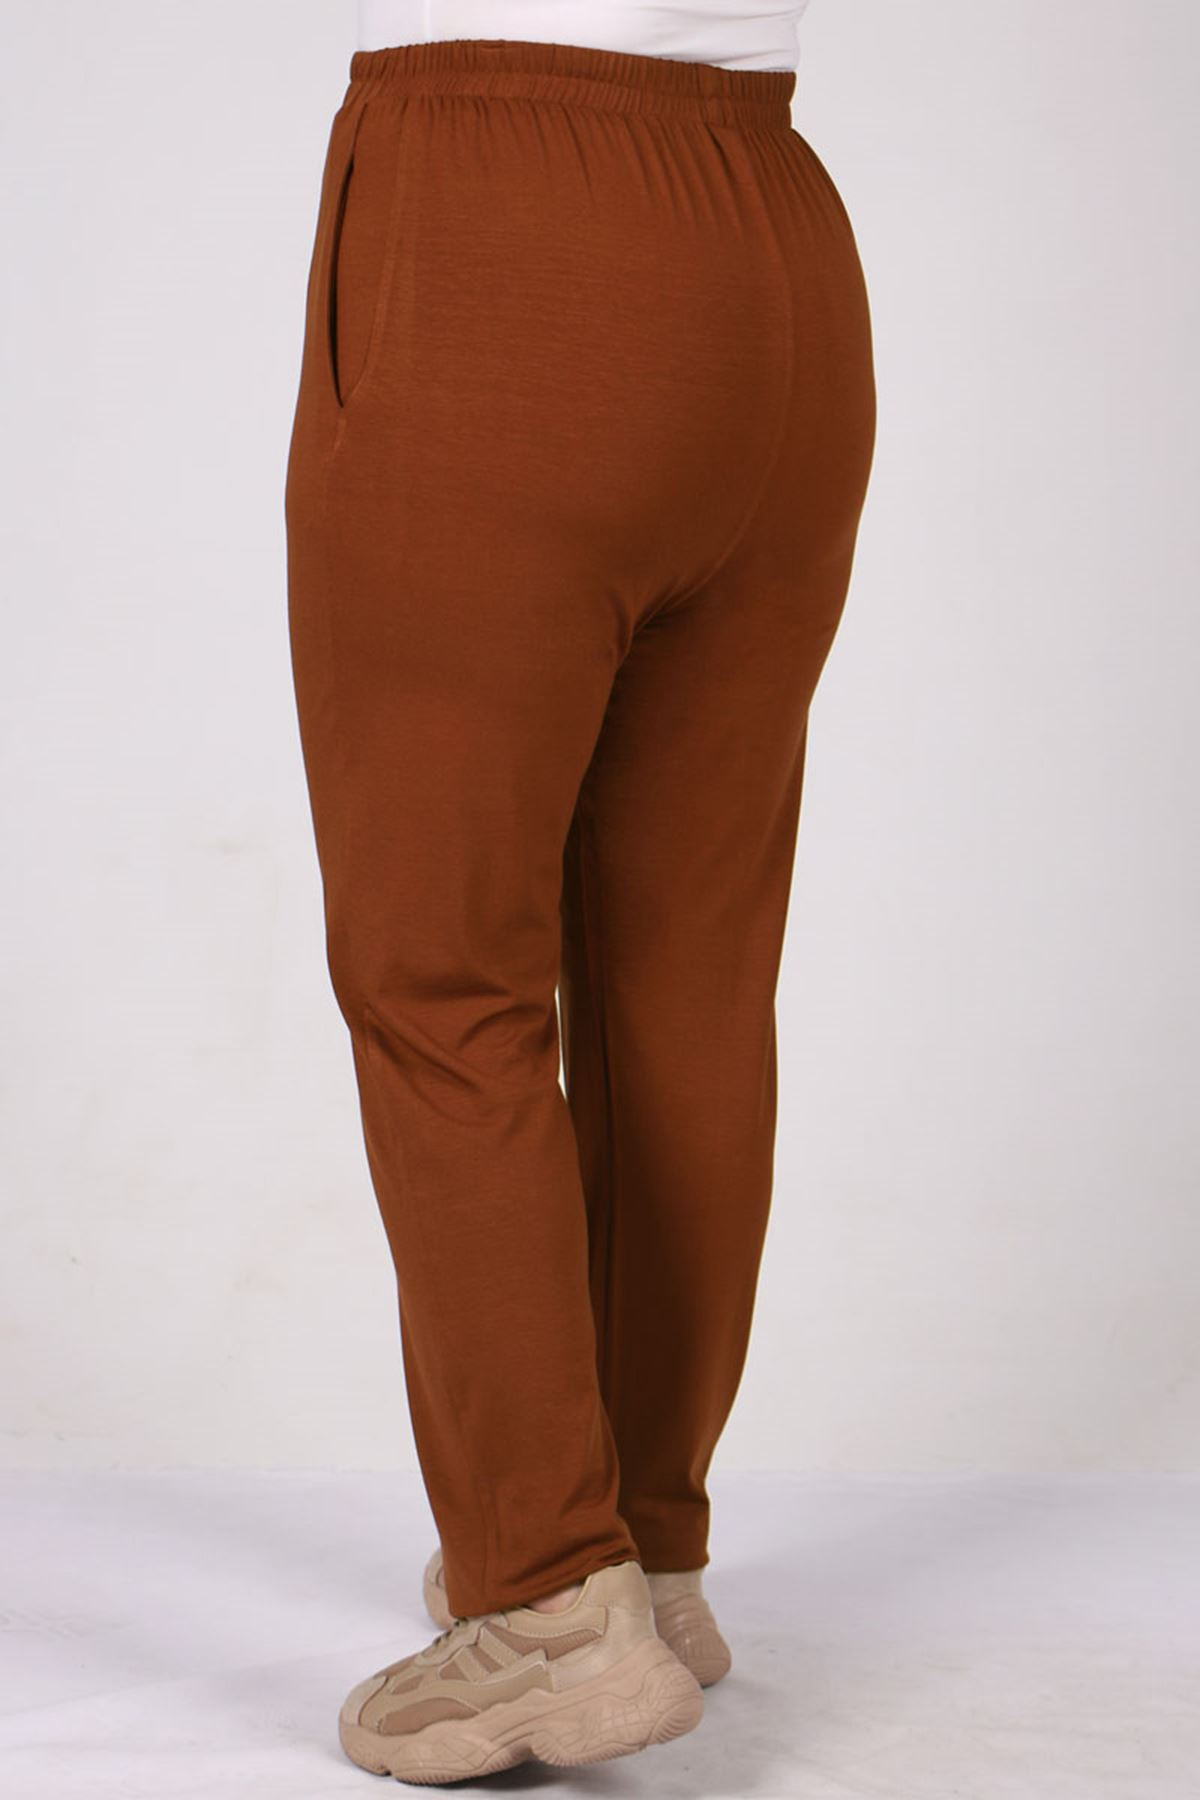 9160 Plus Size High Waist Elastic Pants - Terra Cotta